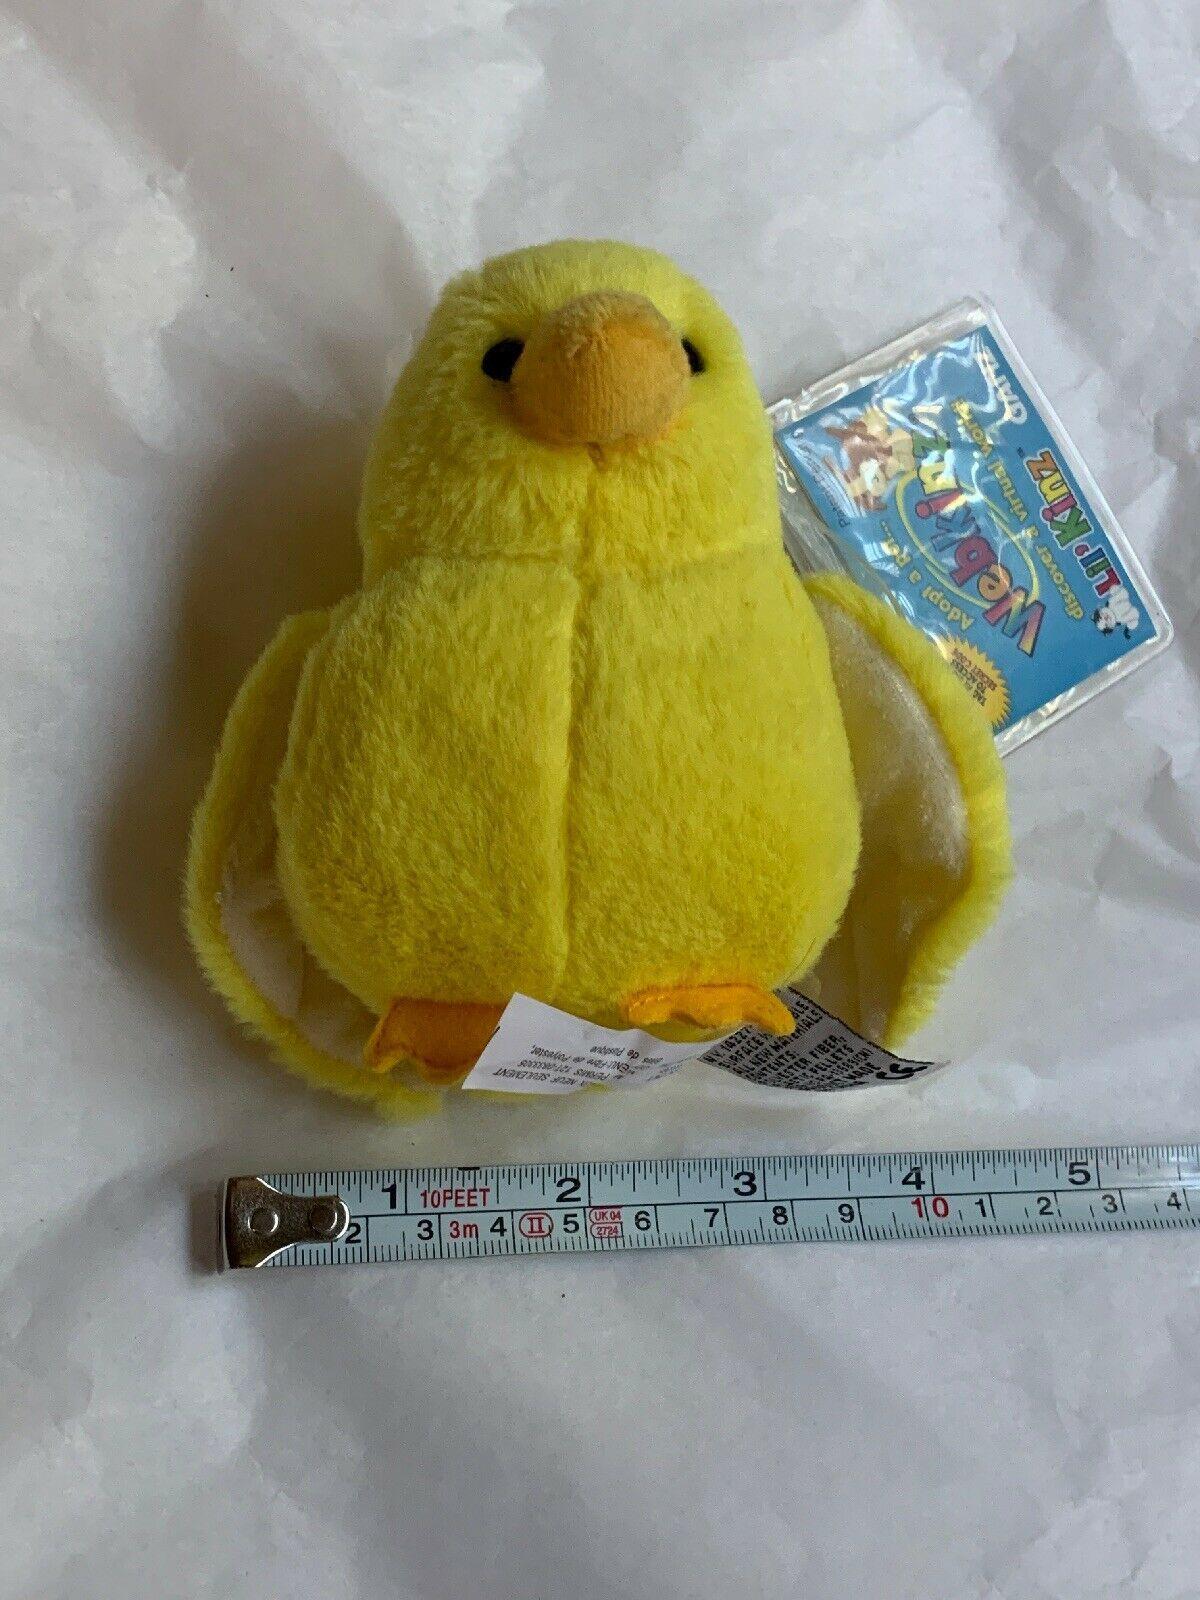 ganz webkinz lil kinz yellow canary bird plush w Code Card • Used Doll Toy Cute image 12